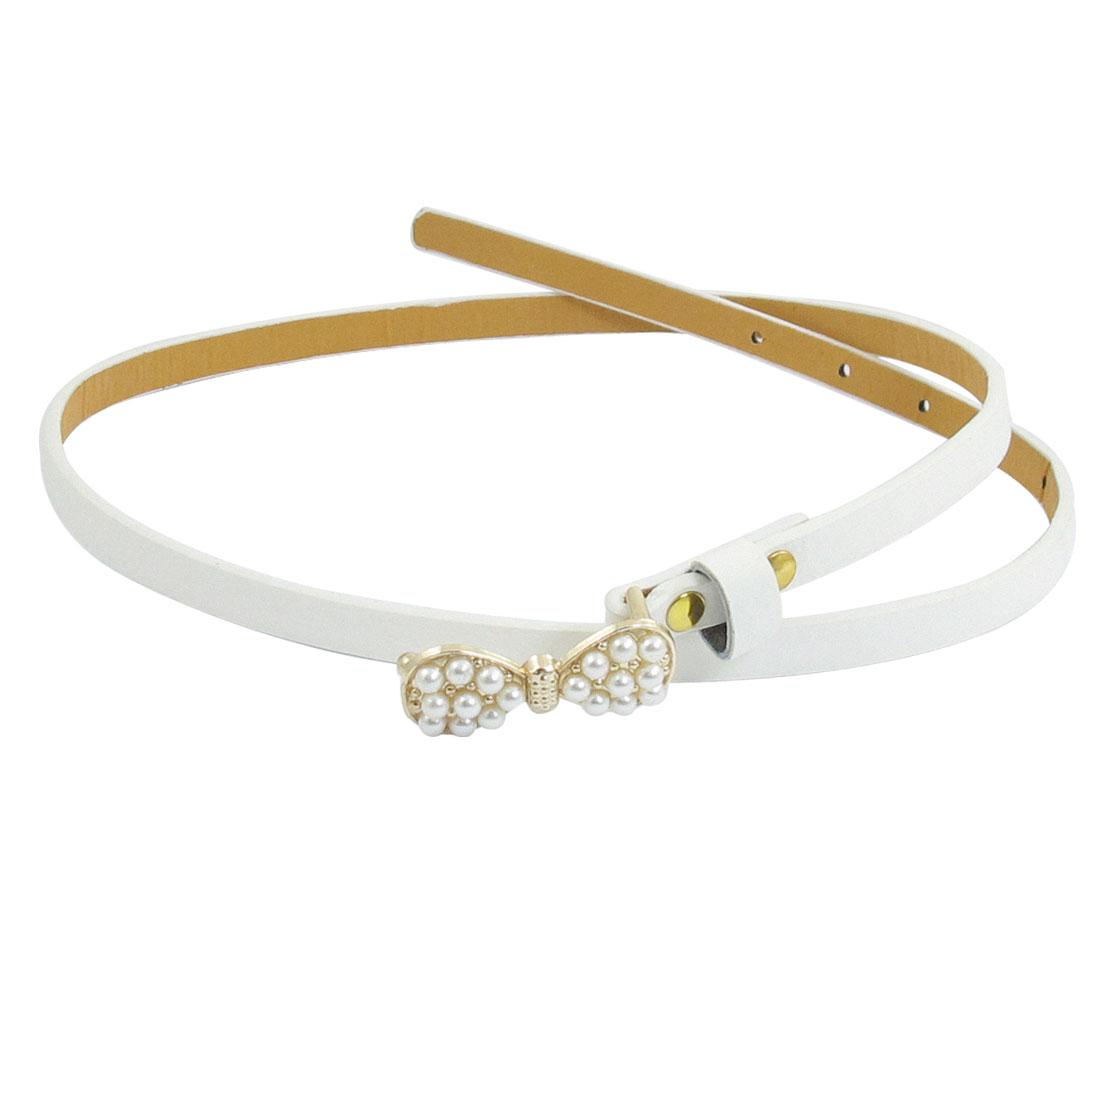 Women Dress Shirt Decor Slim White Adjustable Waistband Belt